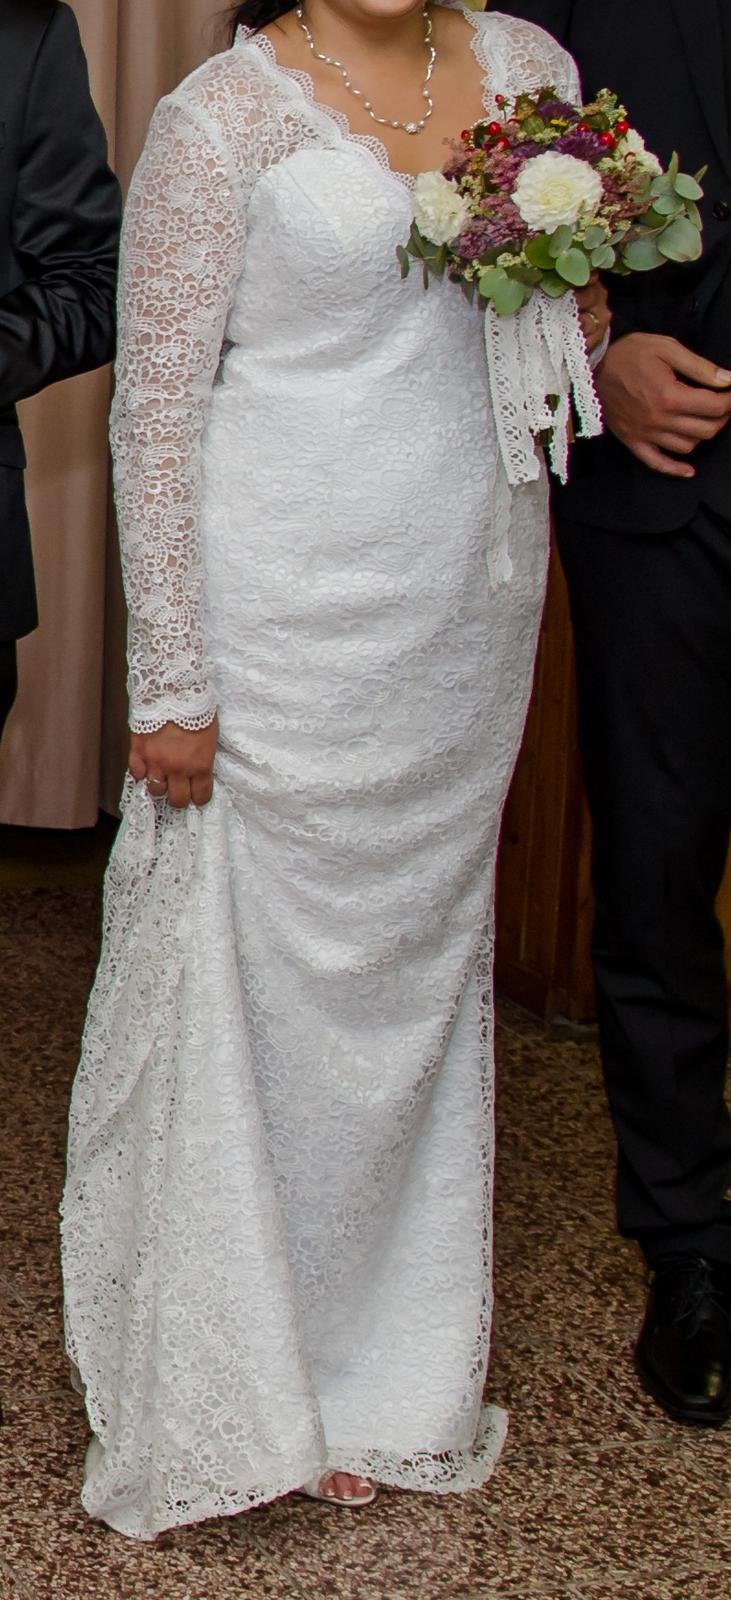 Čipkované svadobné šaty s vlečkou. - Obrázok č. 3